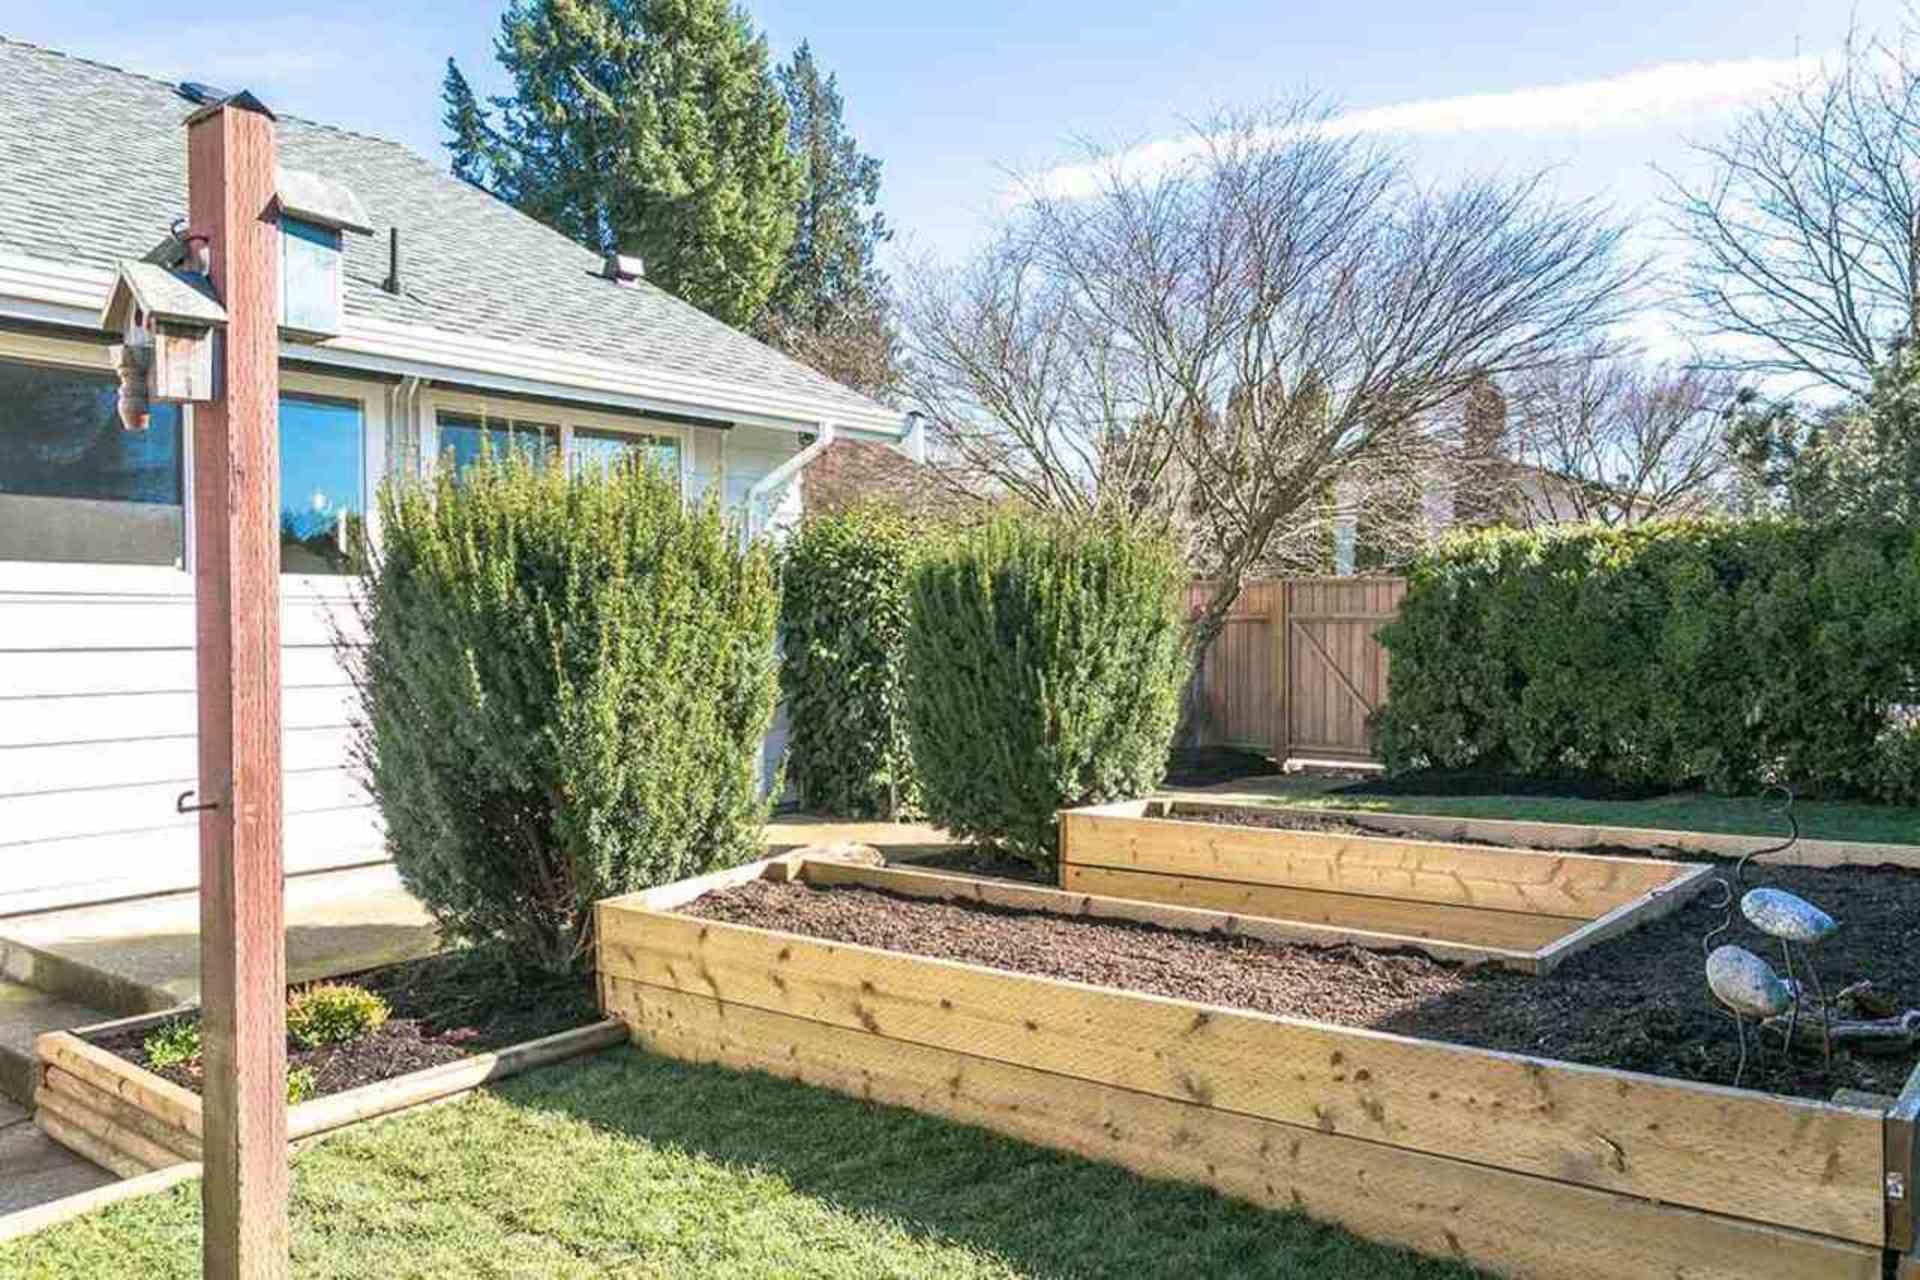 9299-213-street-walnut-grove-langley-17 at 9299 213 Street, Walnut Grove, Langley